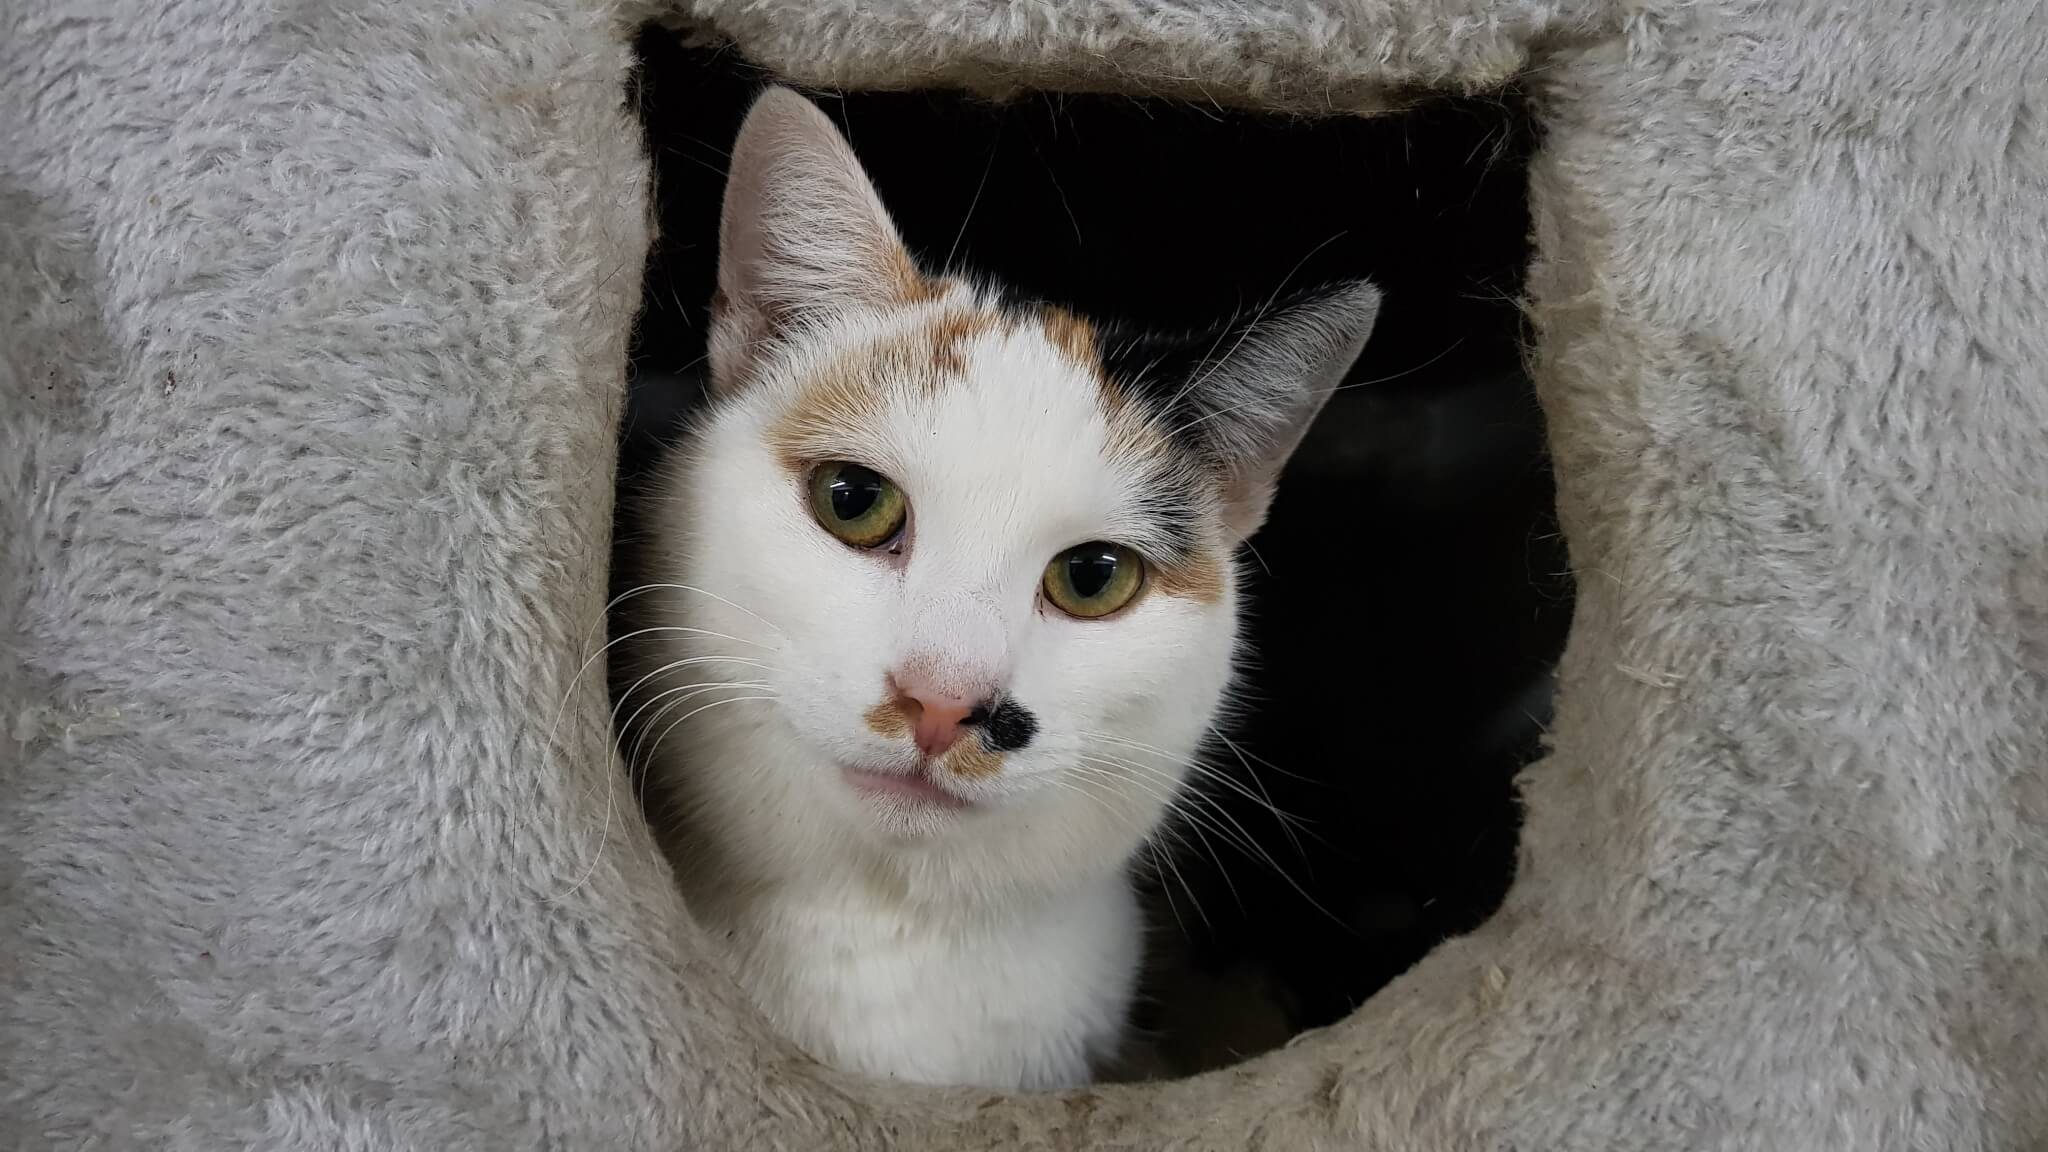 Kitty Monroe